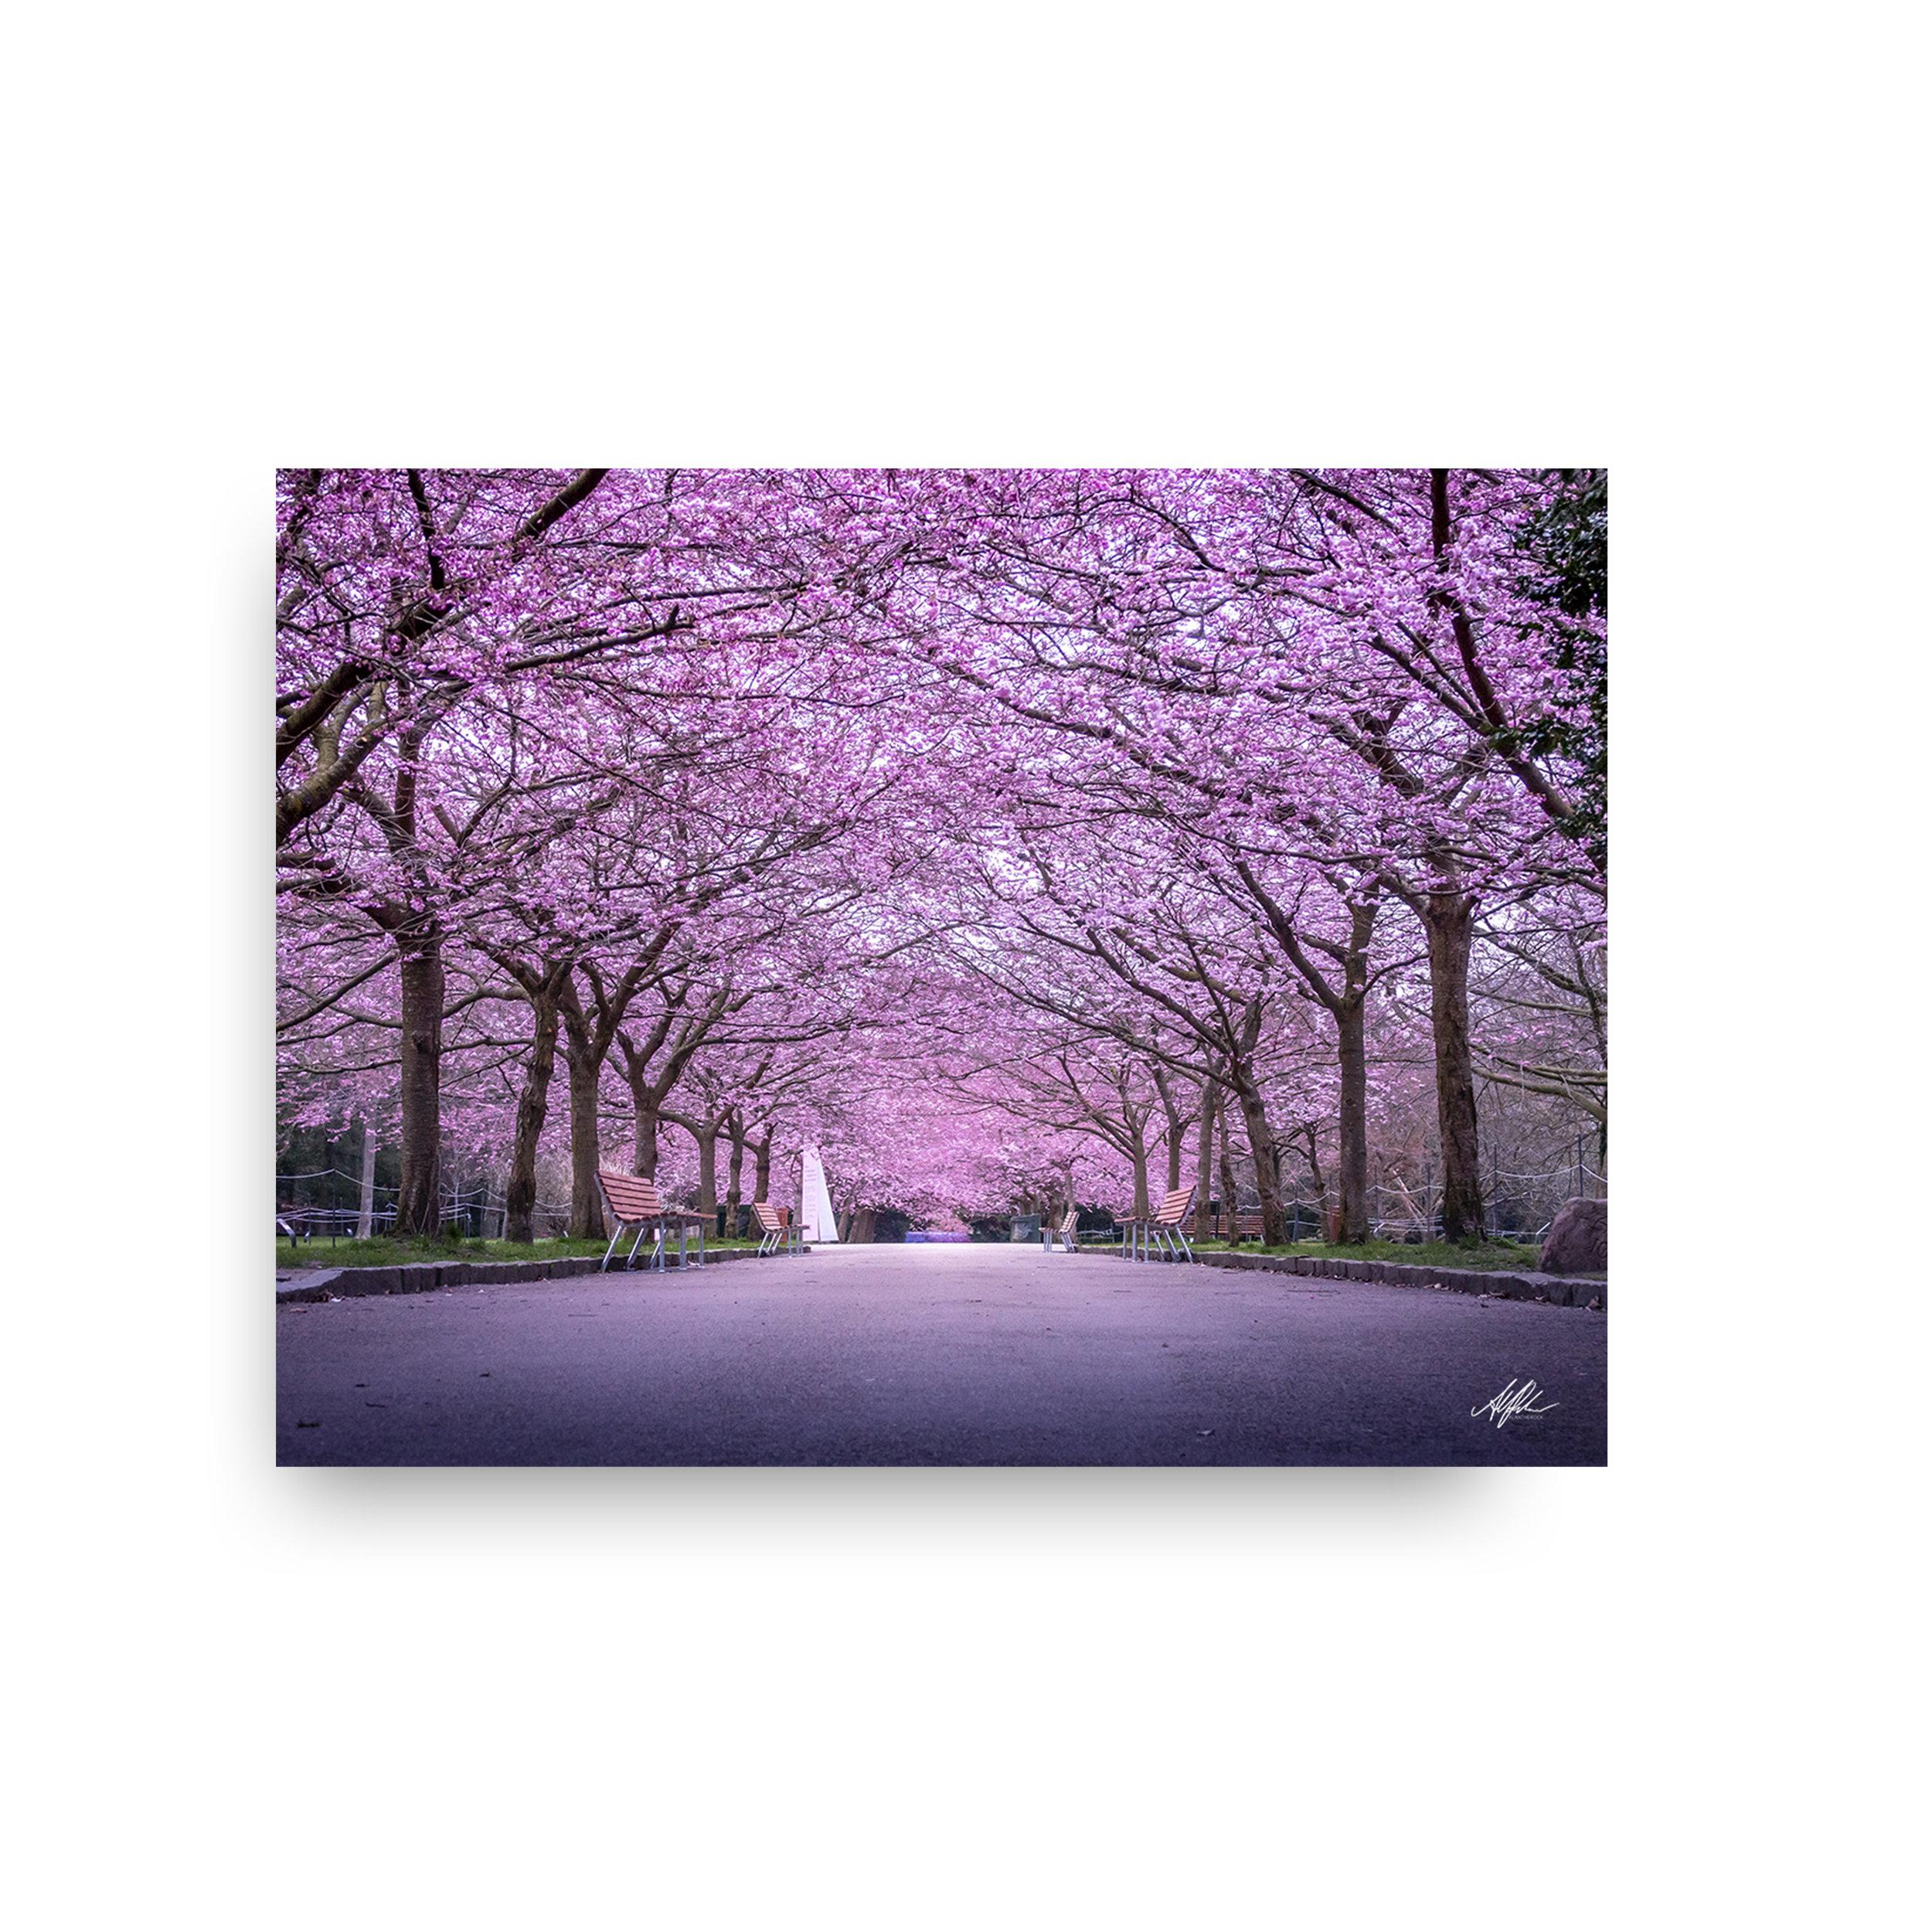 Cherry Blossom - Sakura Season 2019 - Alantherock